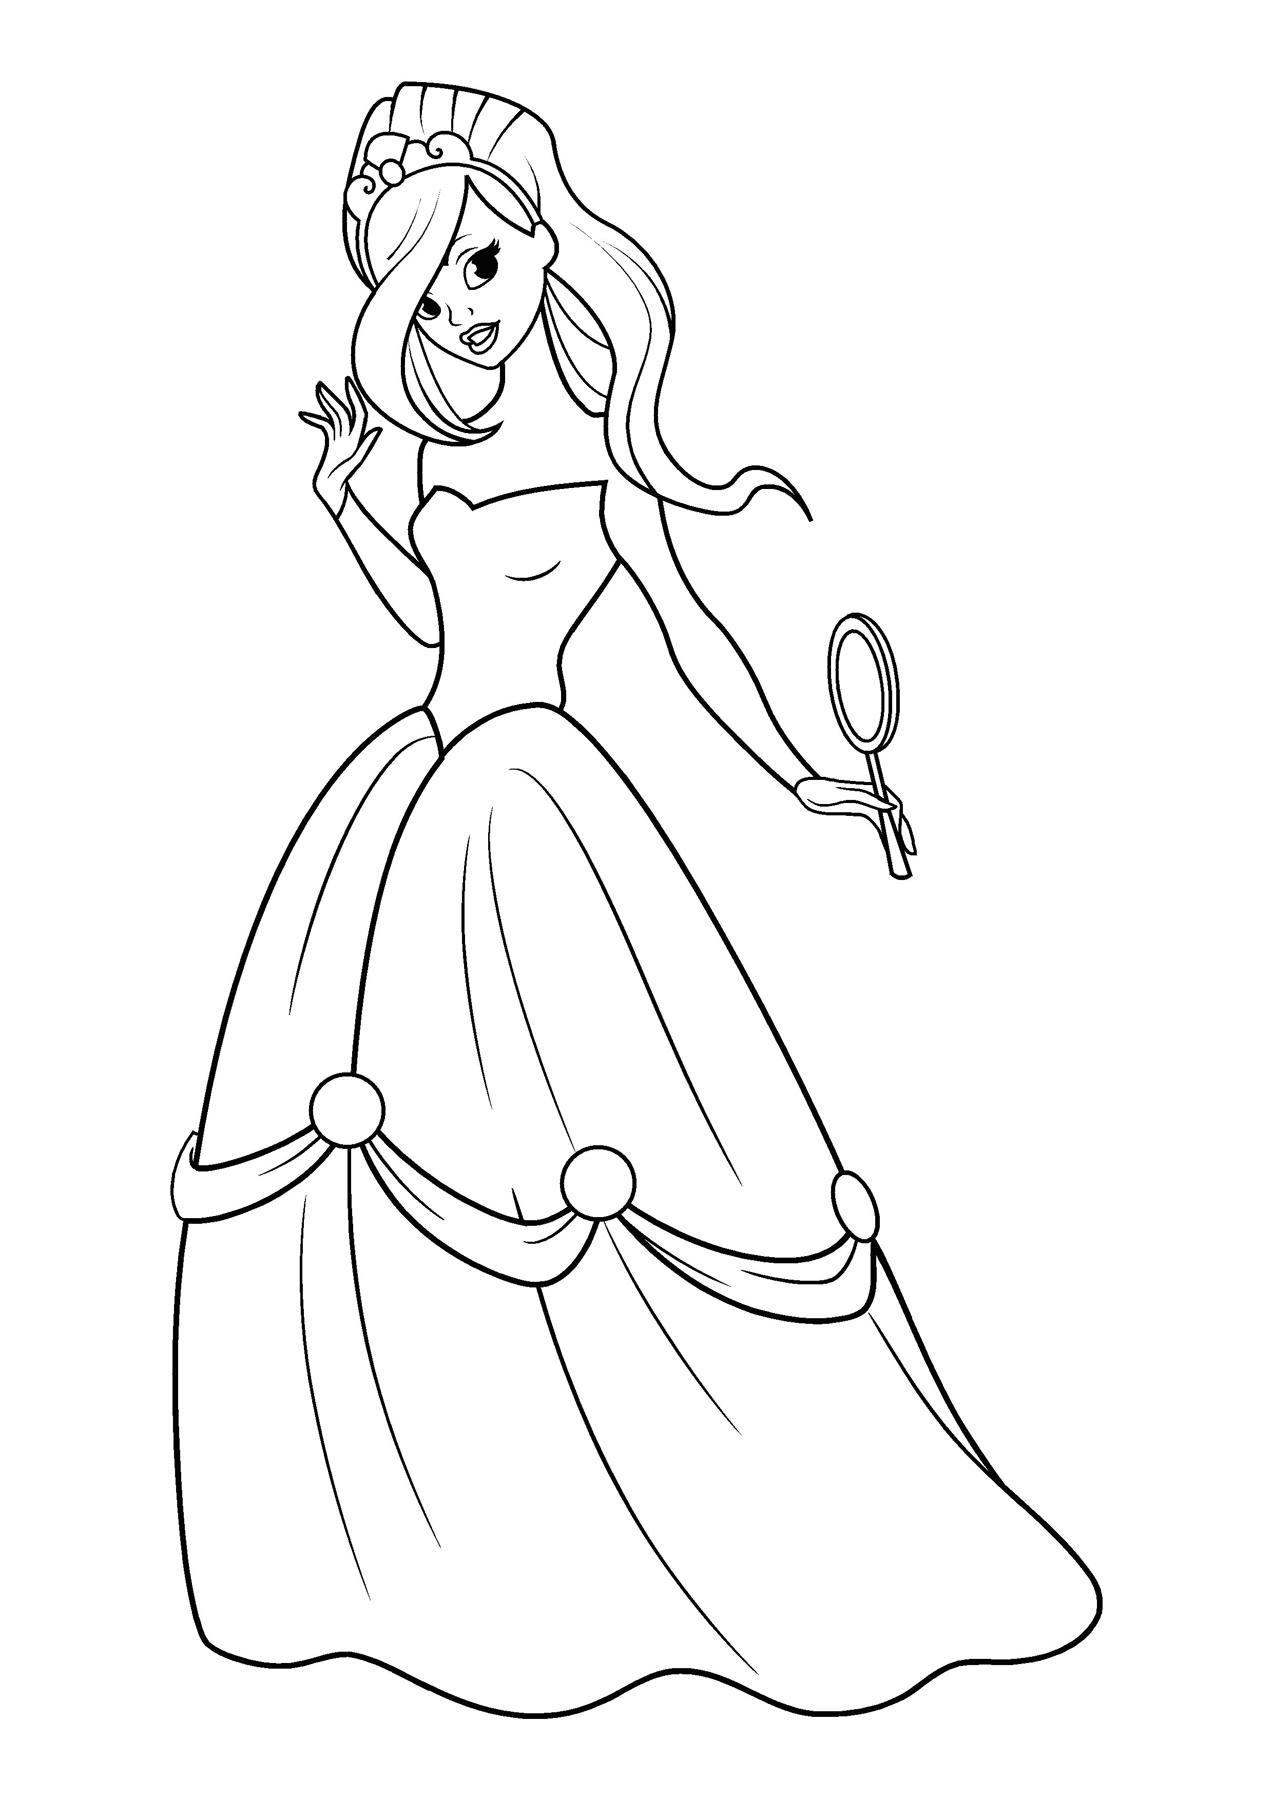 Принцесса с зеркалом - razukrashki.com